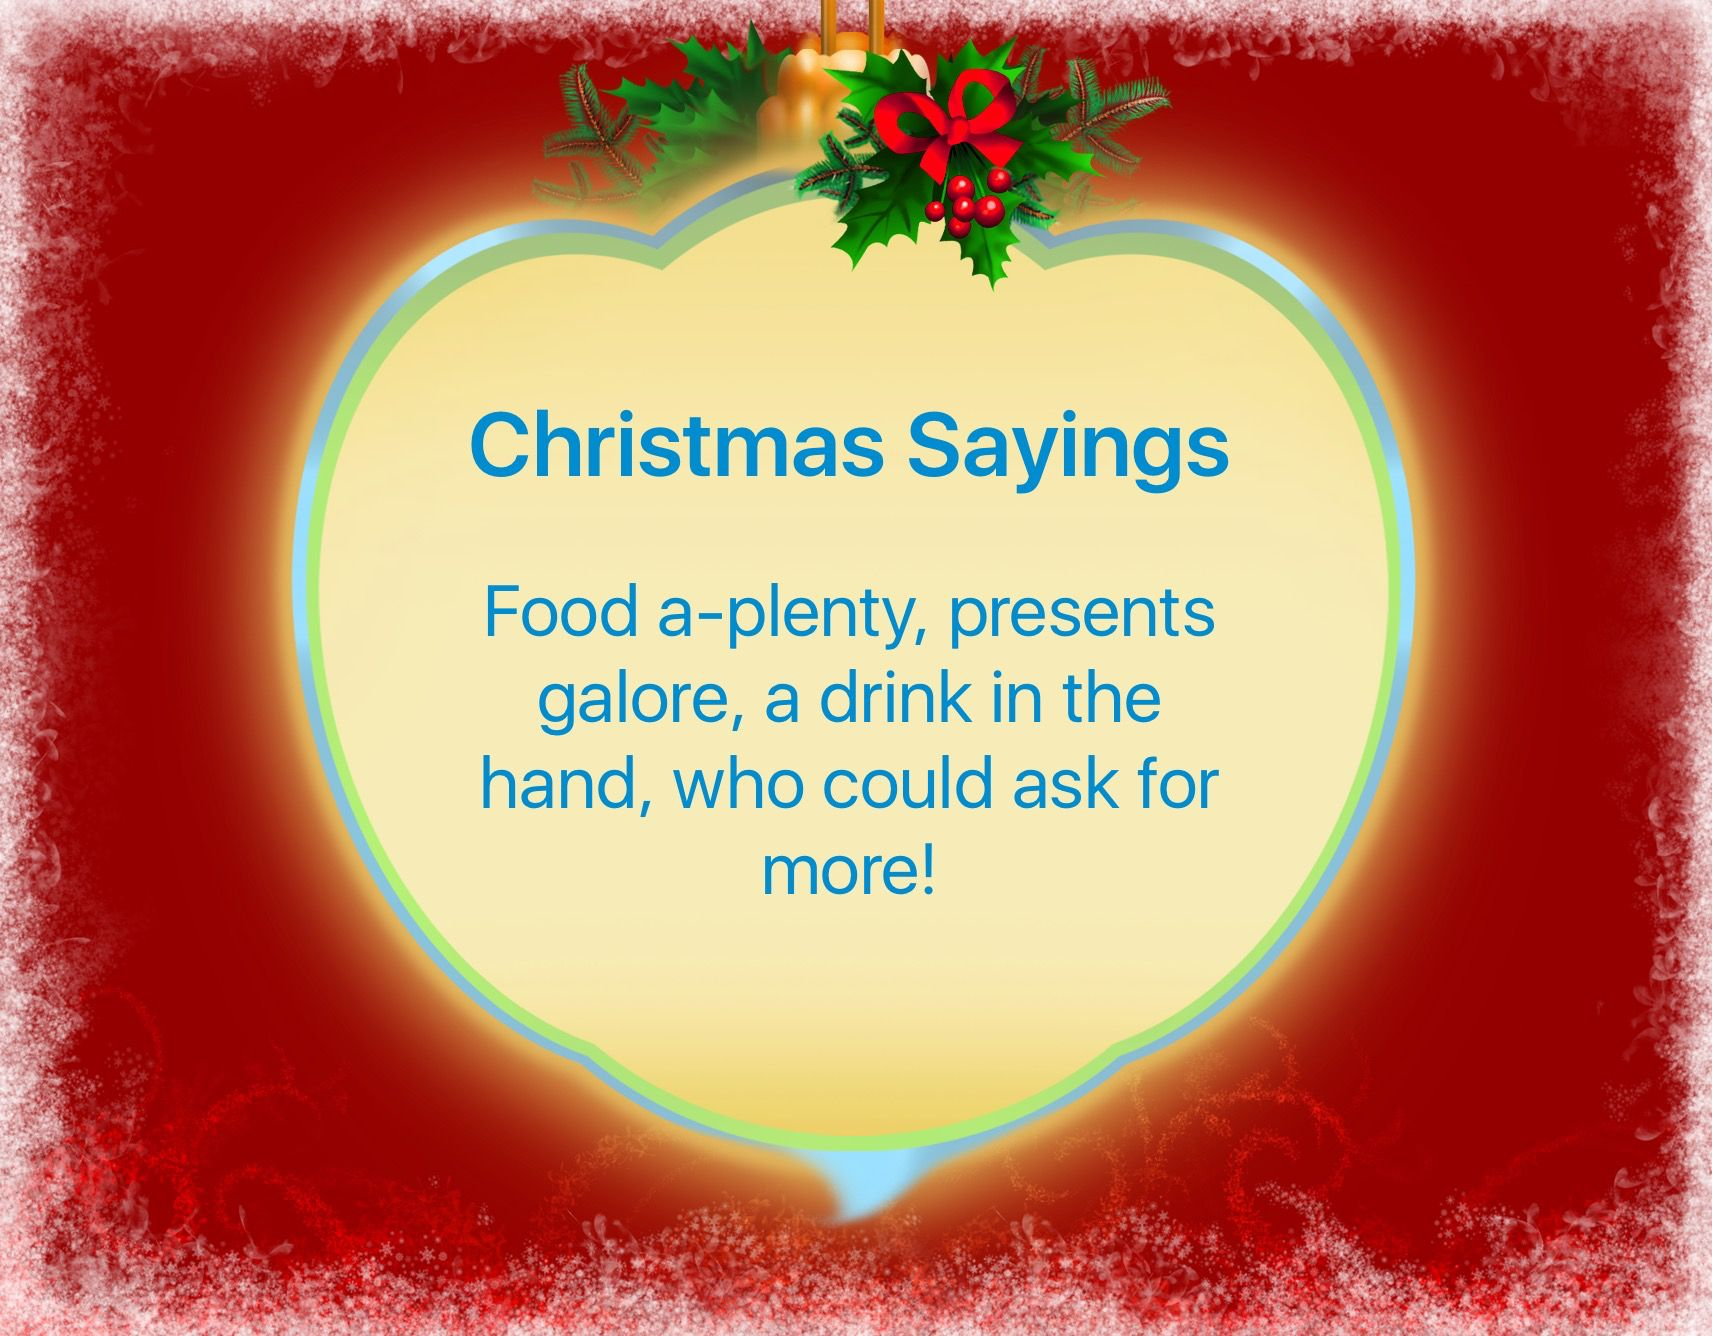 15 days until Christmas! ☃